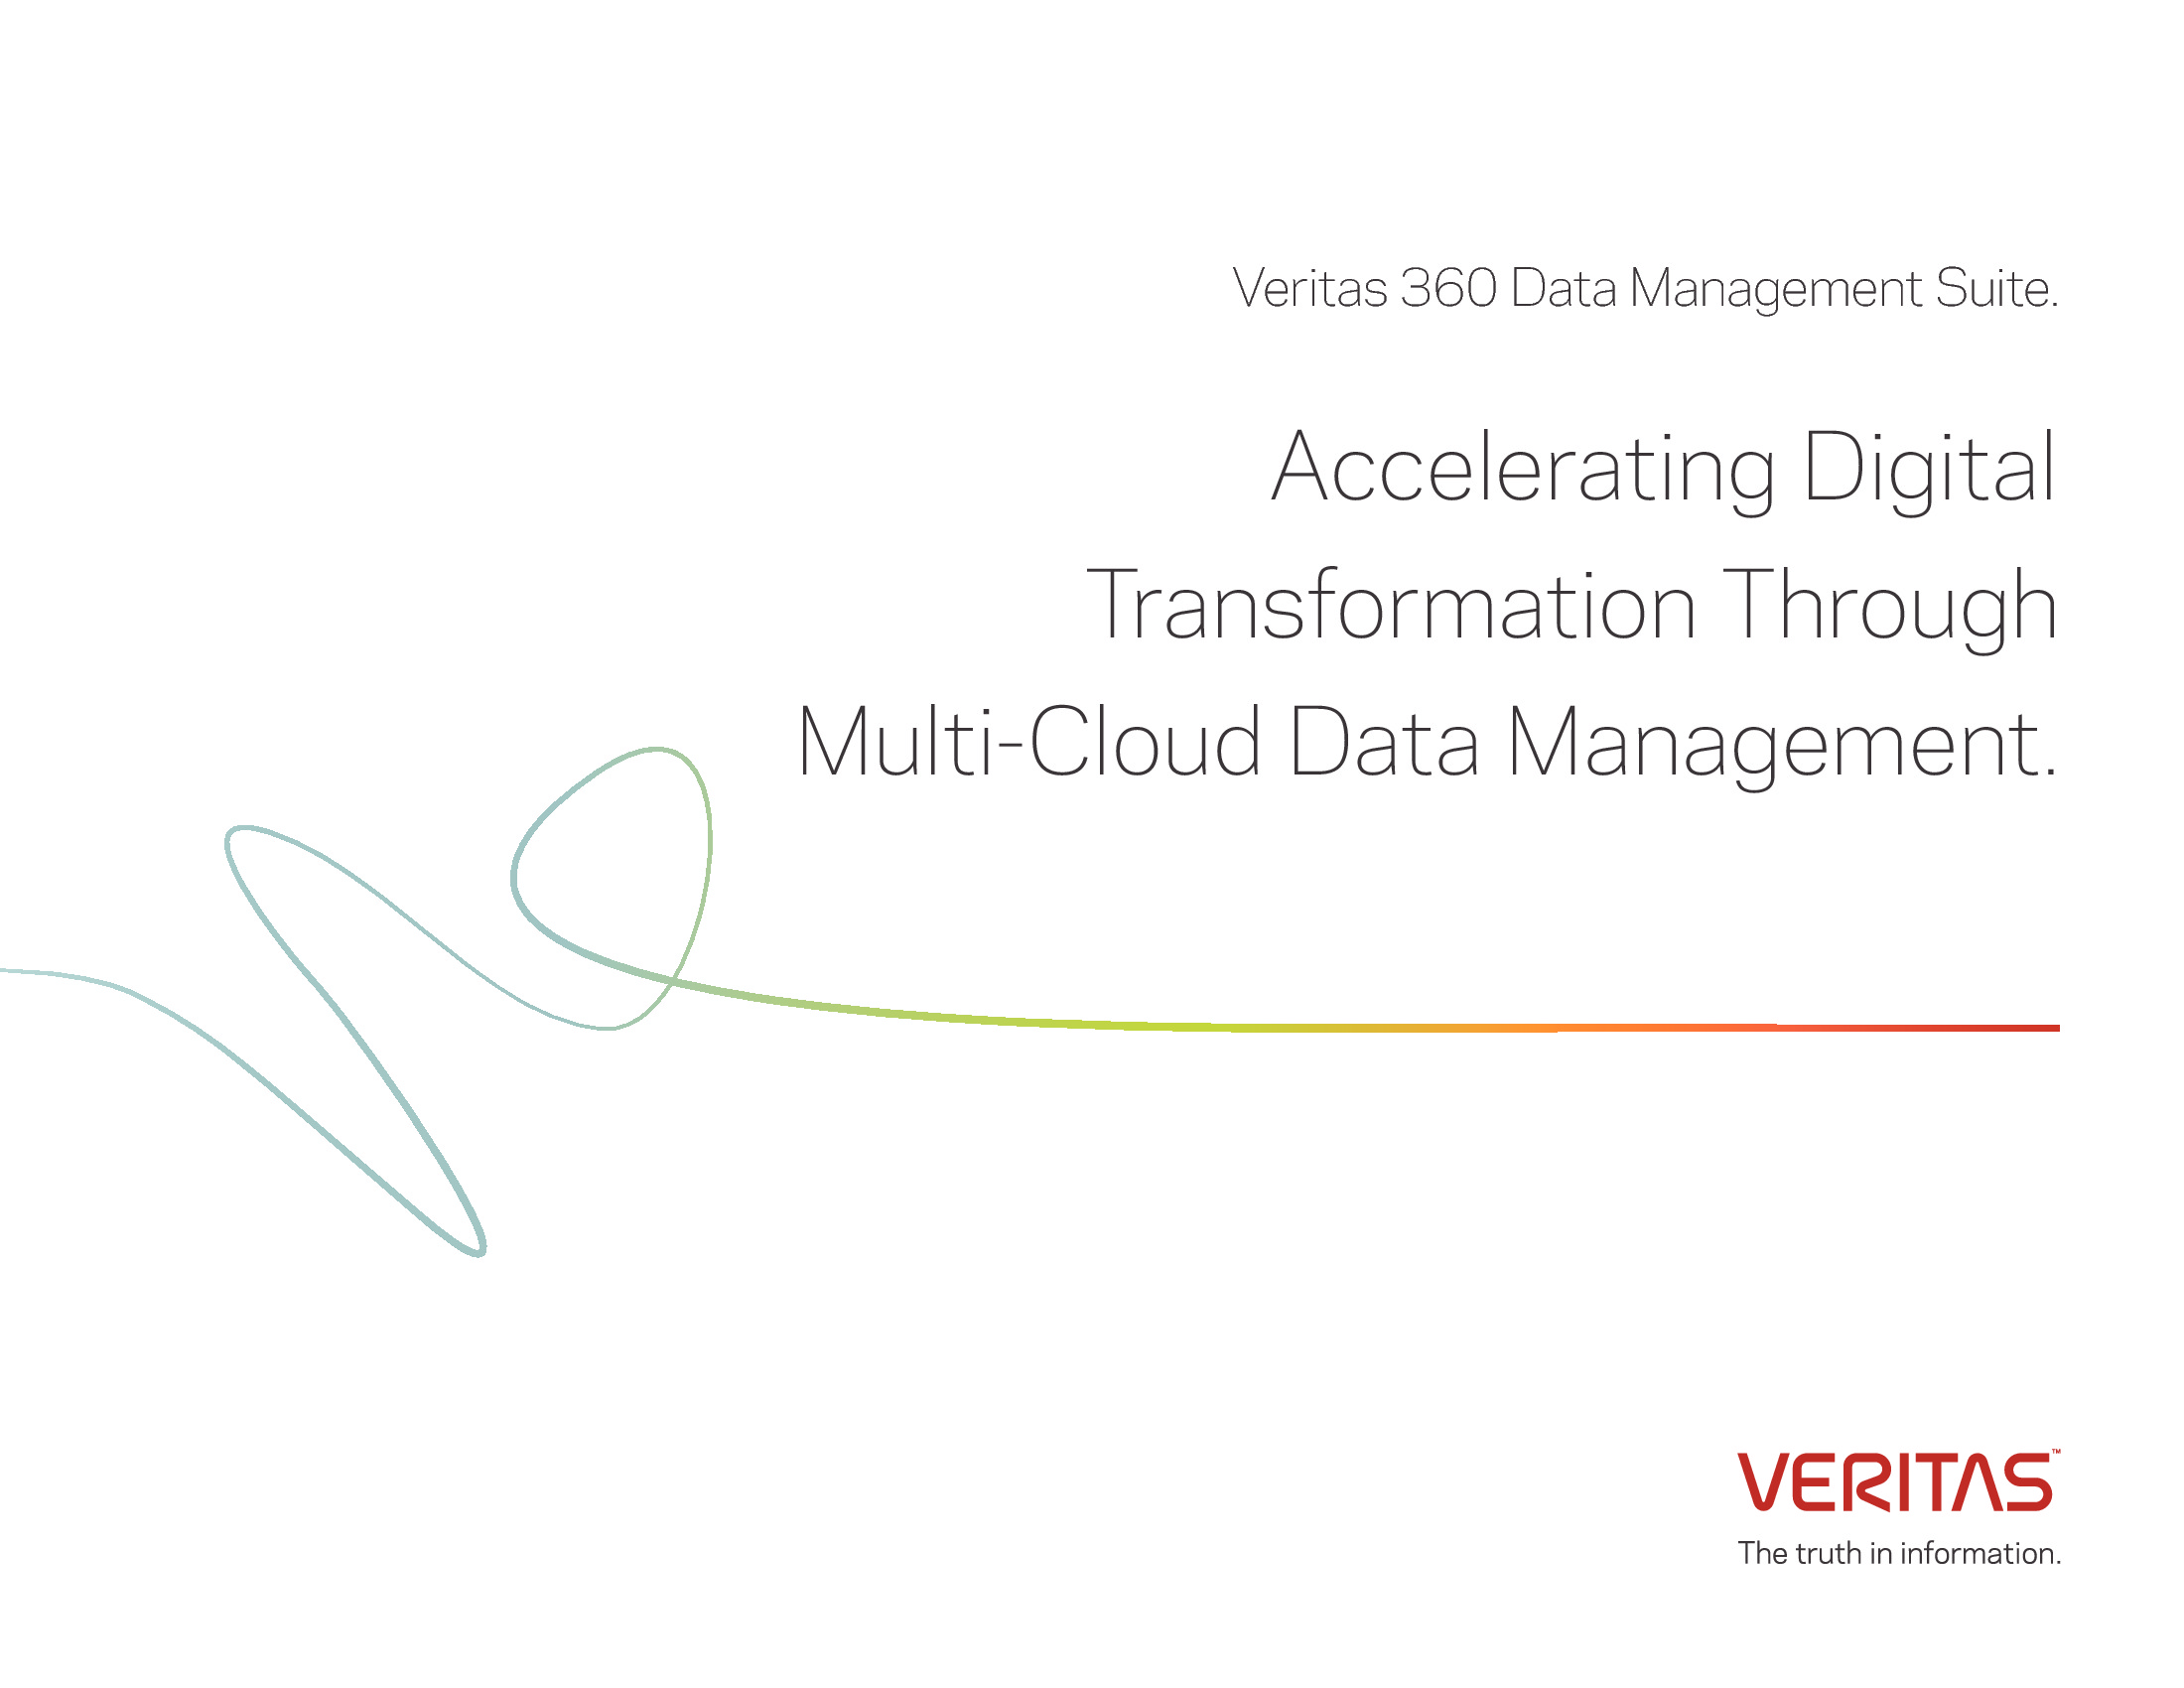 GT - Veritas - 2018 Data Channel - Digital Transformation